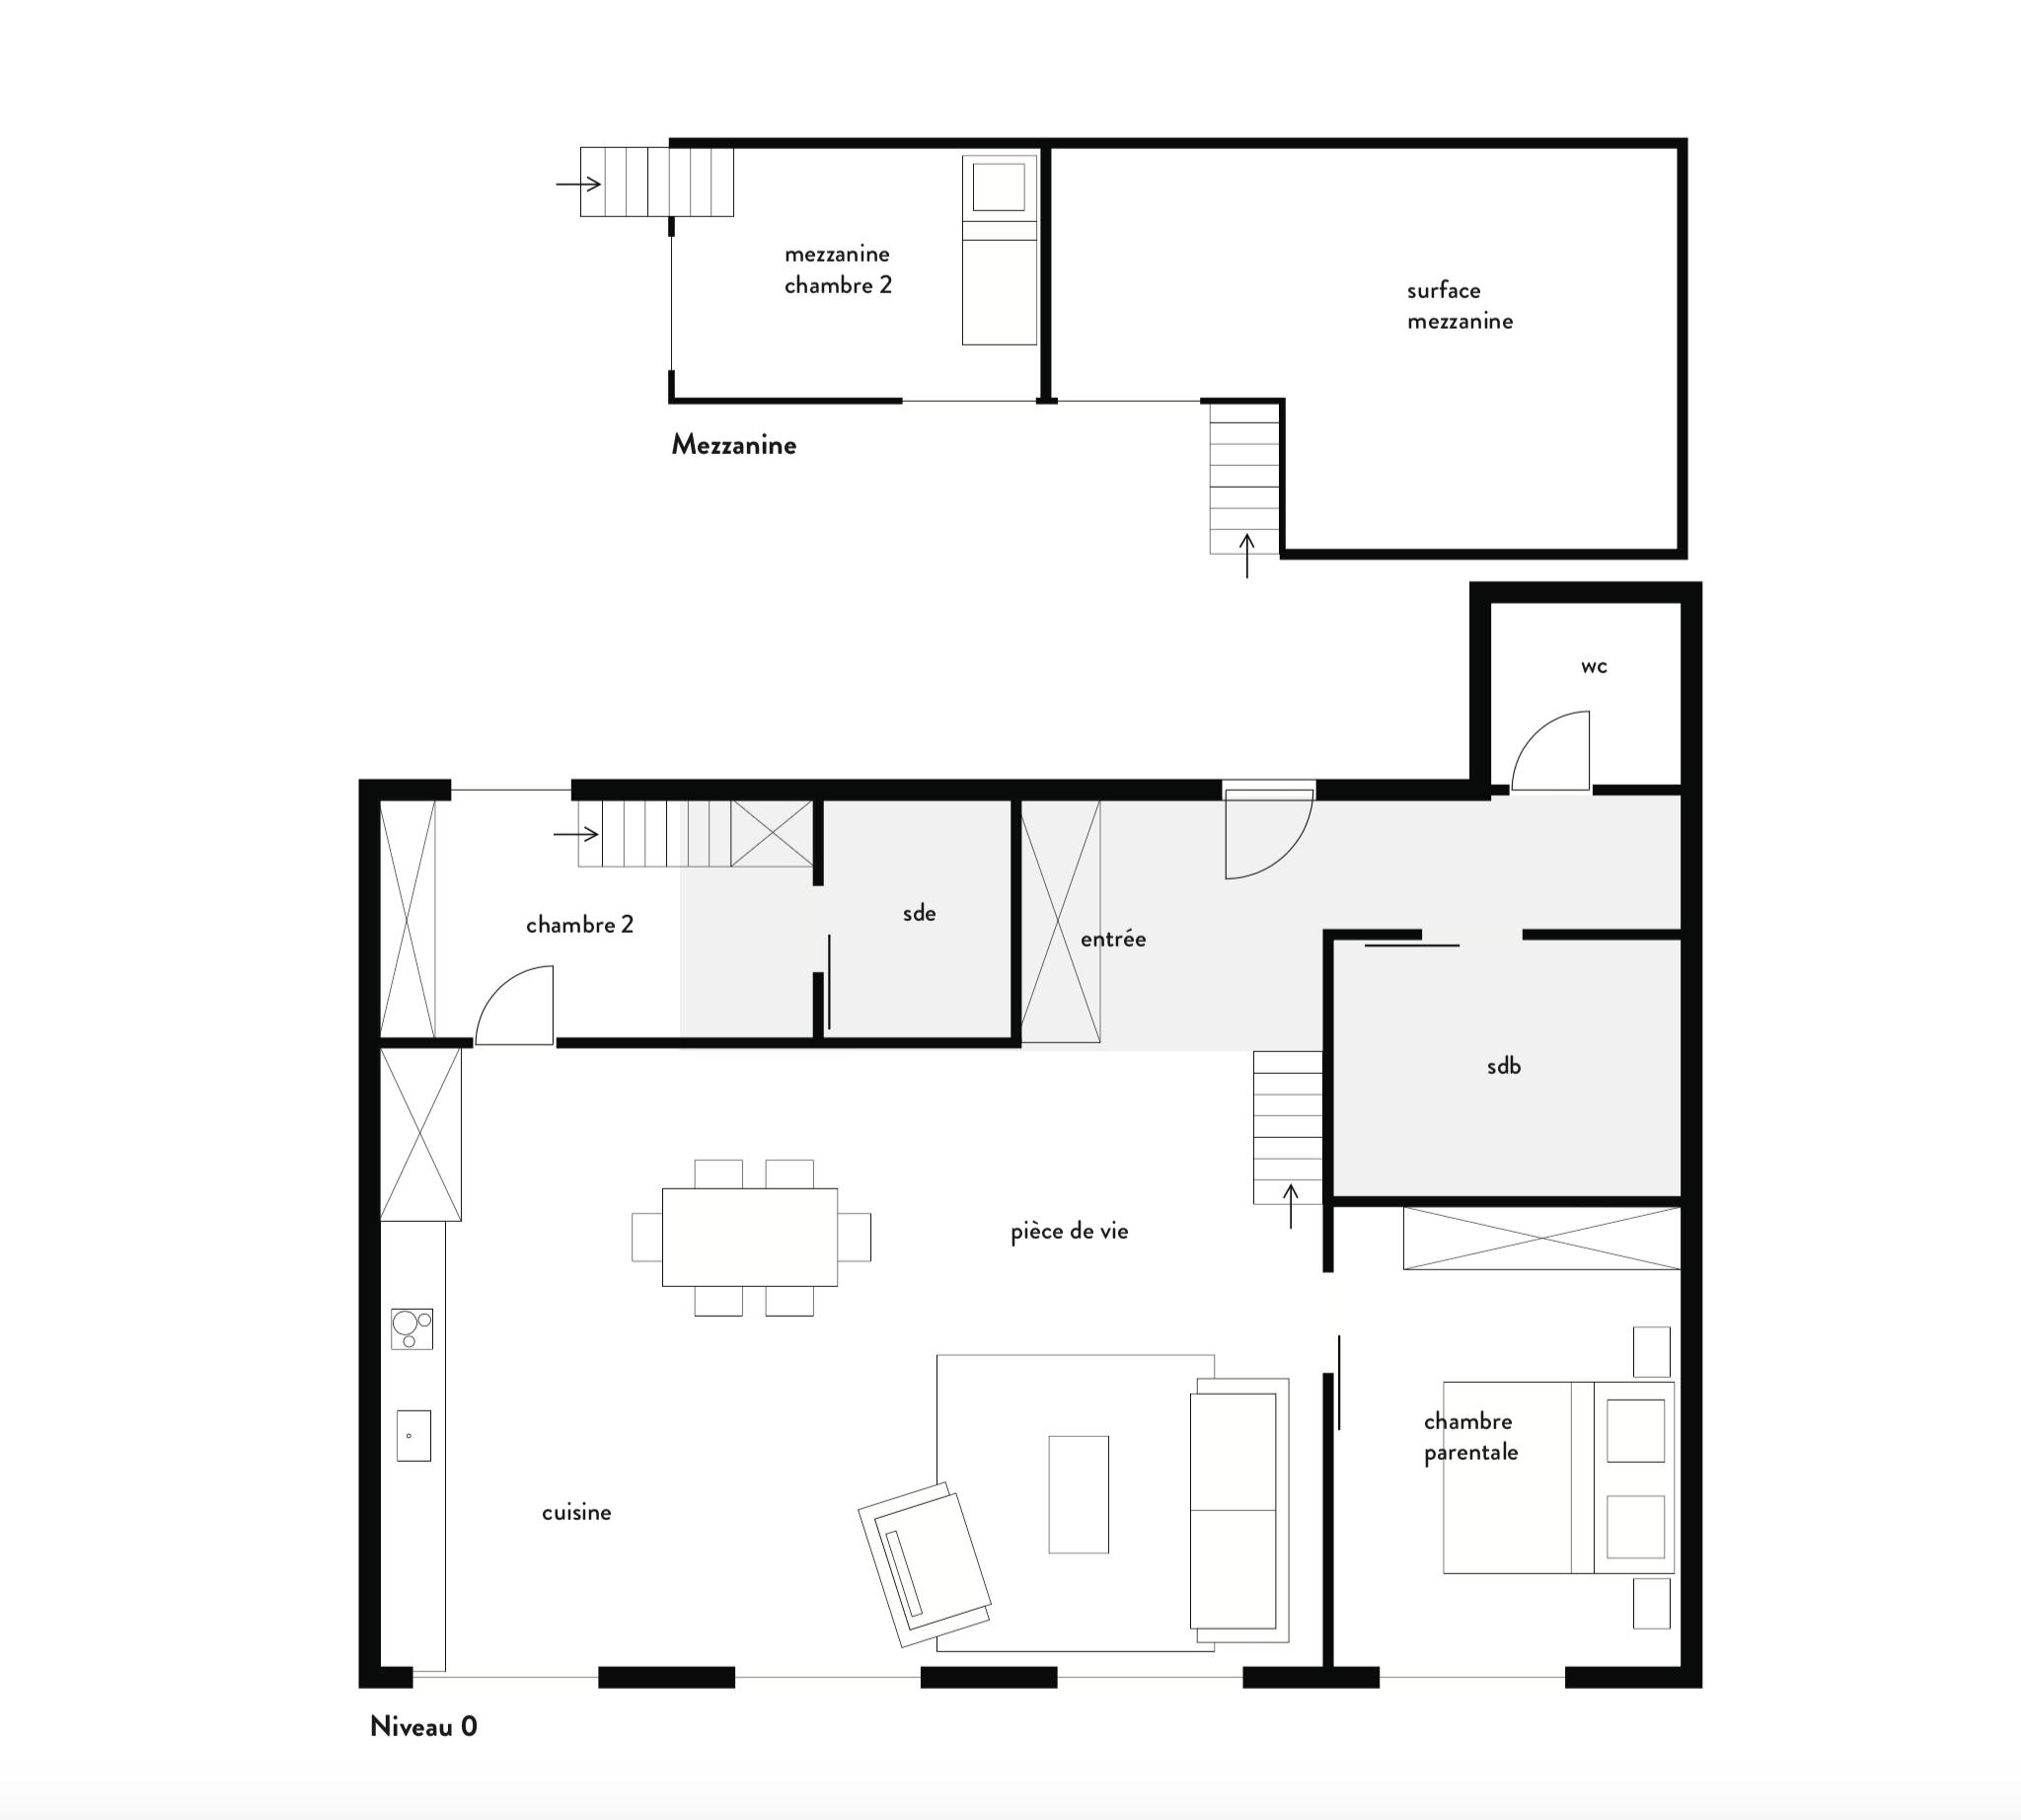 Plan de projection en T3 avec mezzanines